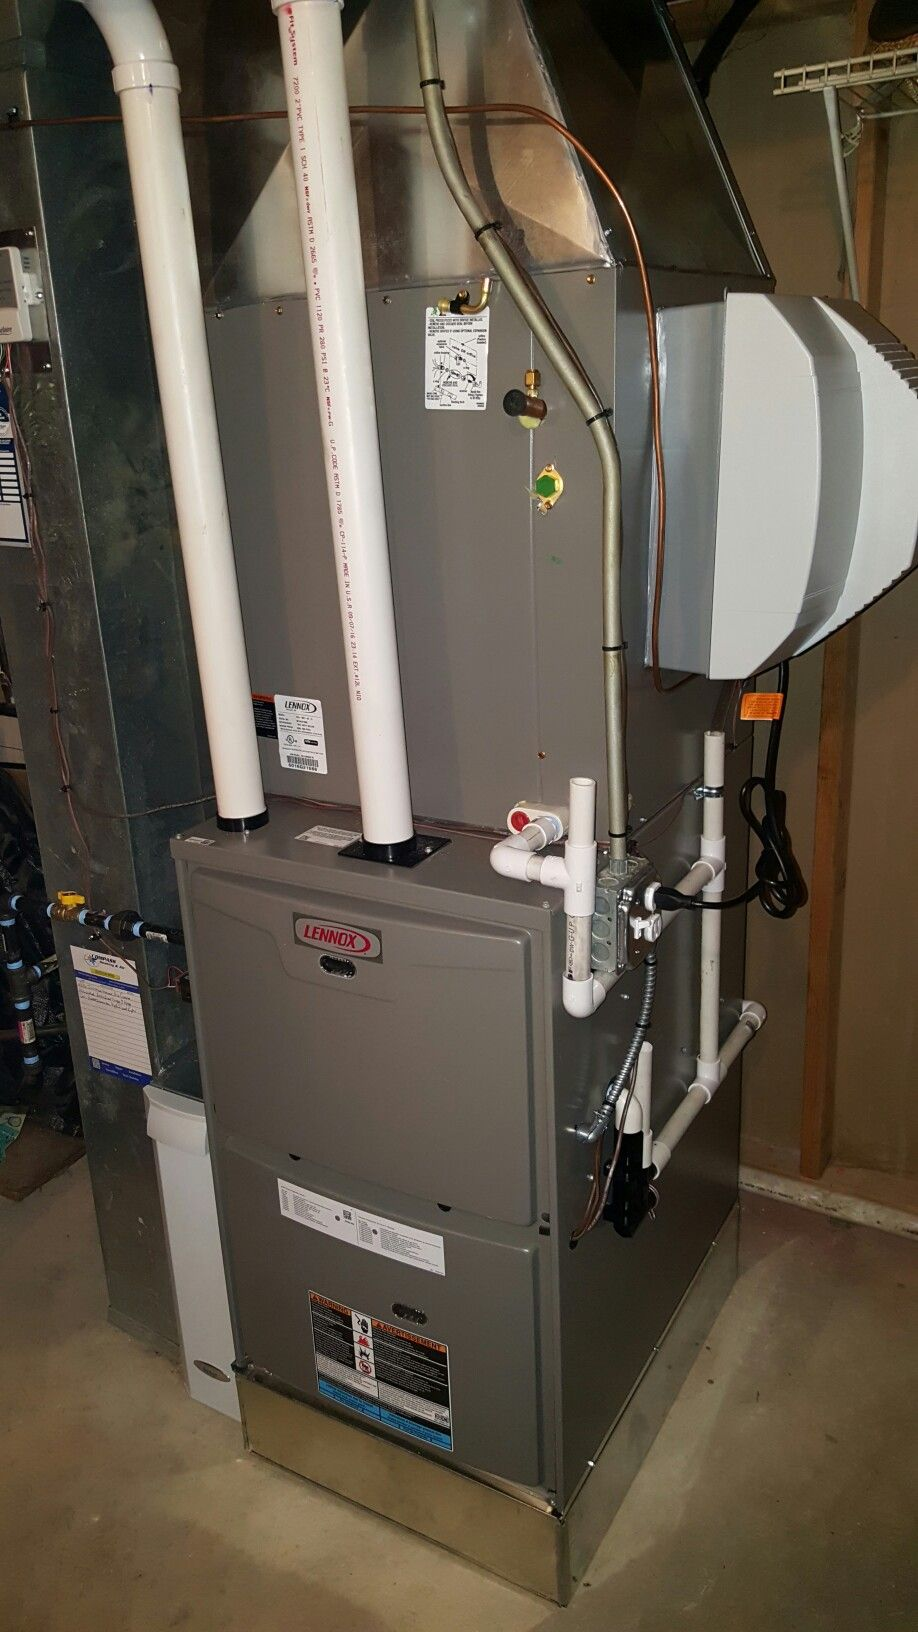 Lennox High Efficiency Furnaces Wiring Diagram | Wiring ...